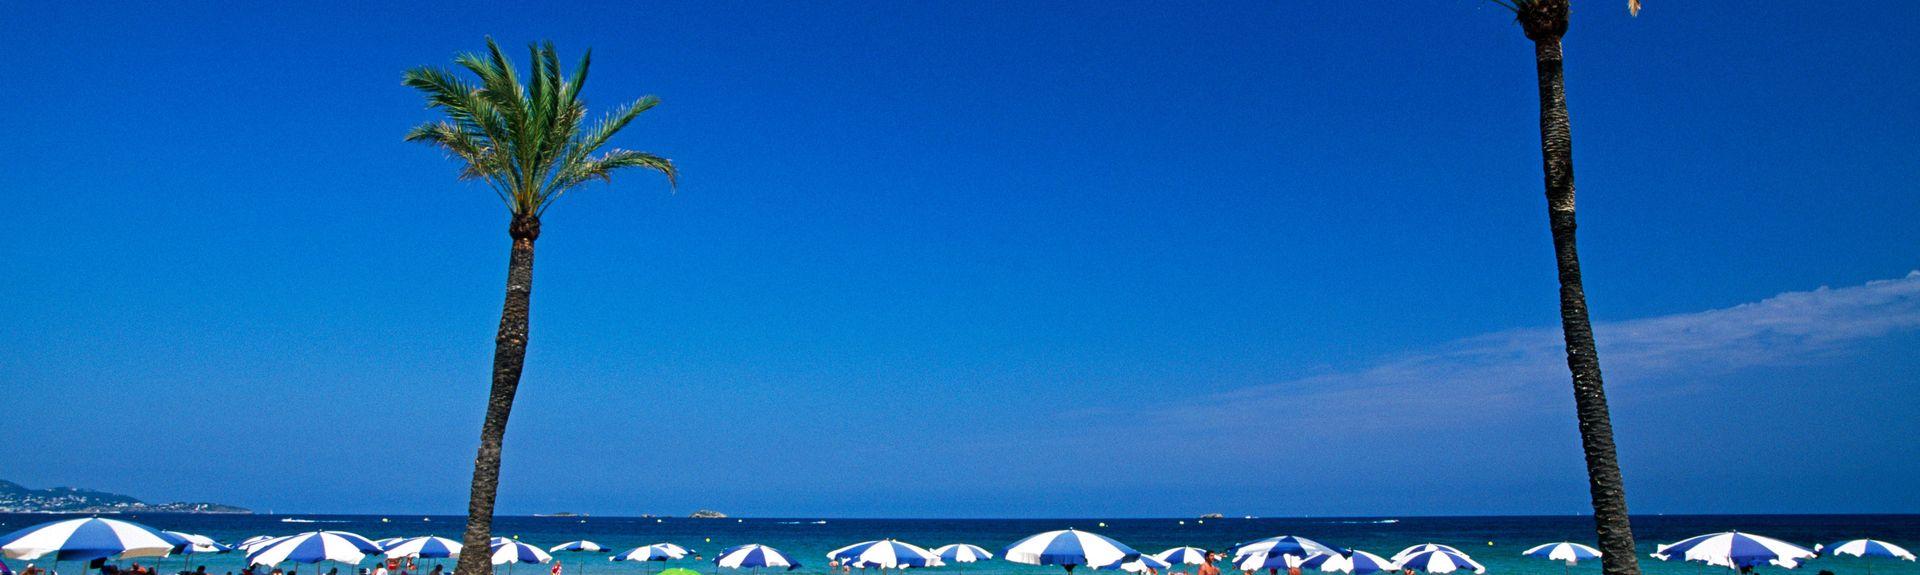 Playa d'en Bossa, Balearische Inseln, Spanien